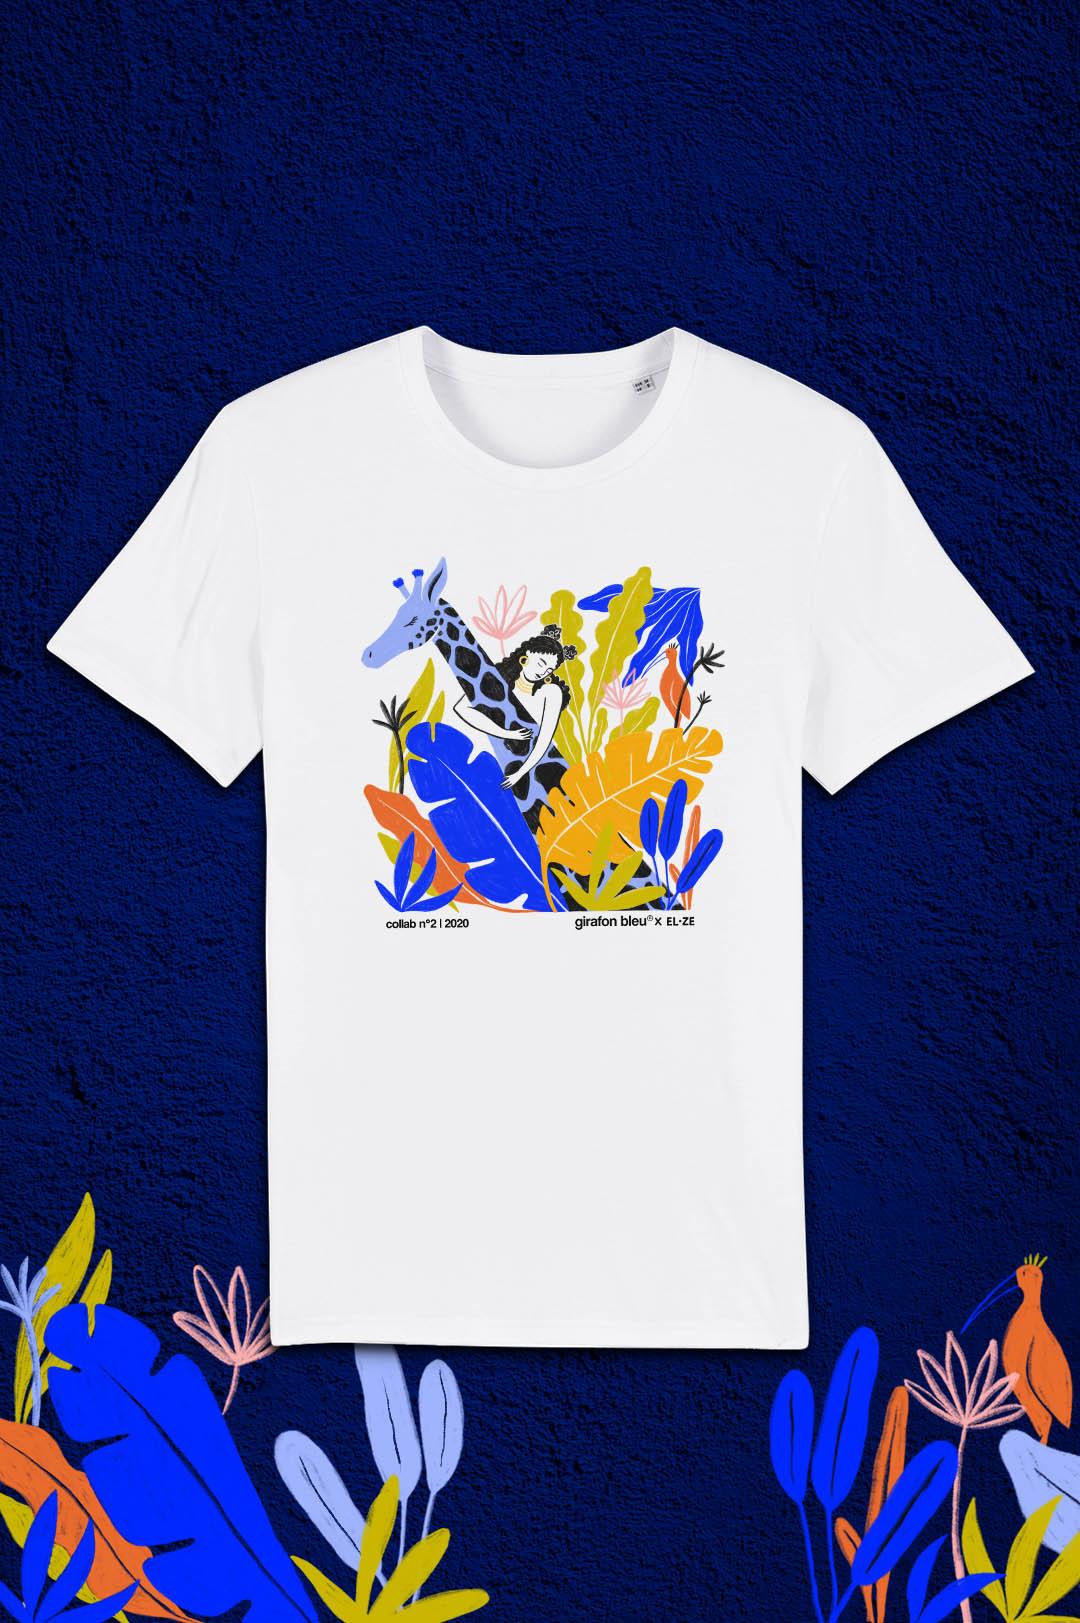 girafon-bleu-x-eloze-version-tshirt-coton-site